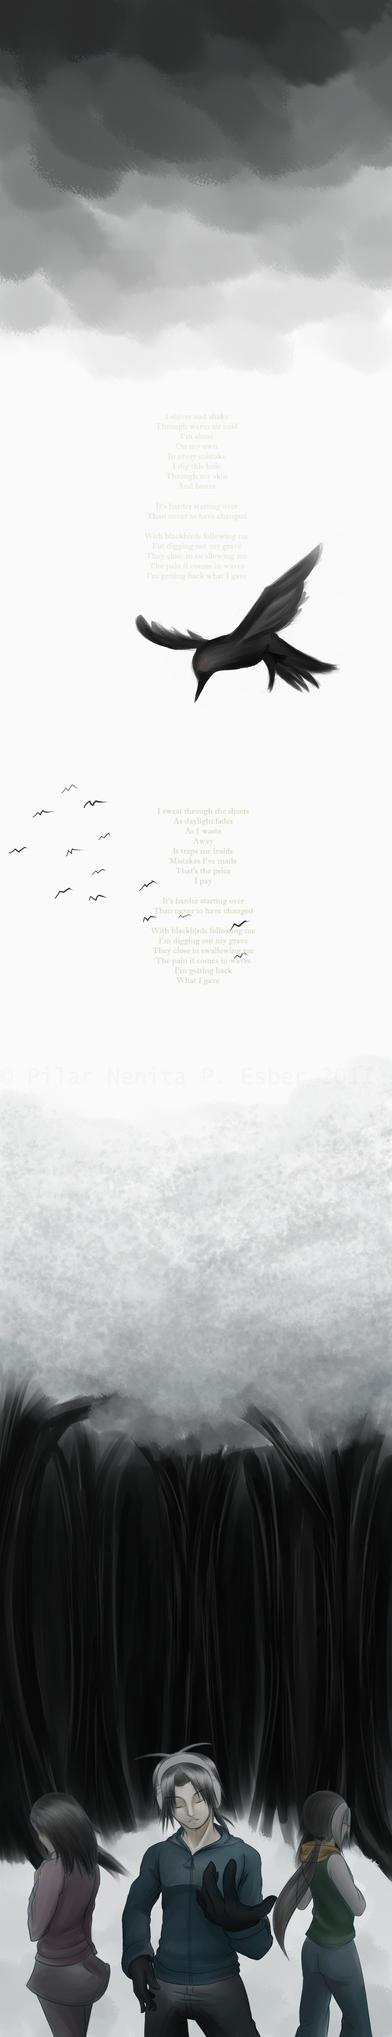 Blackbirds by witch-girl-pilar